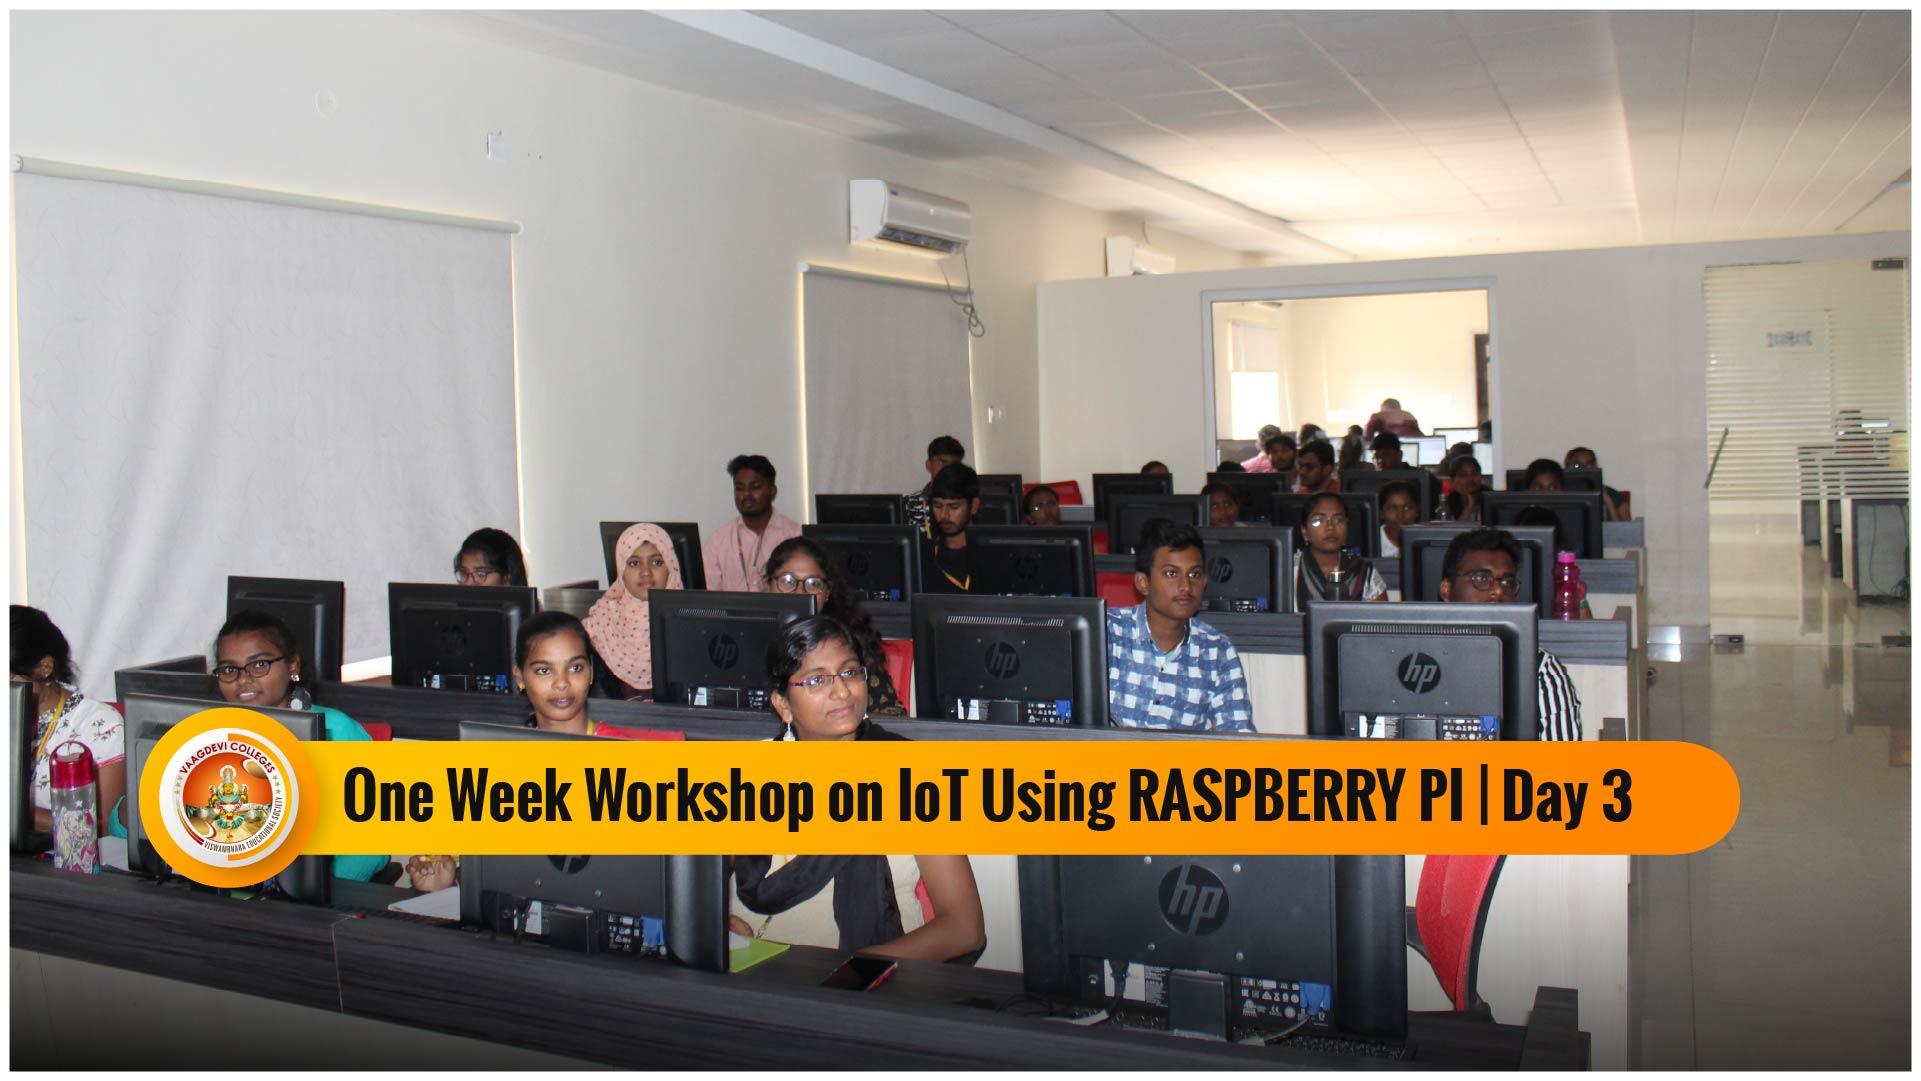 ONE WEEK WORKSHOP ON IOT USING RASPBERRY PI DAY 3